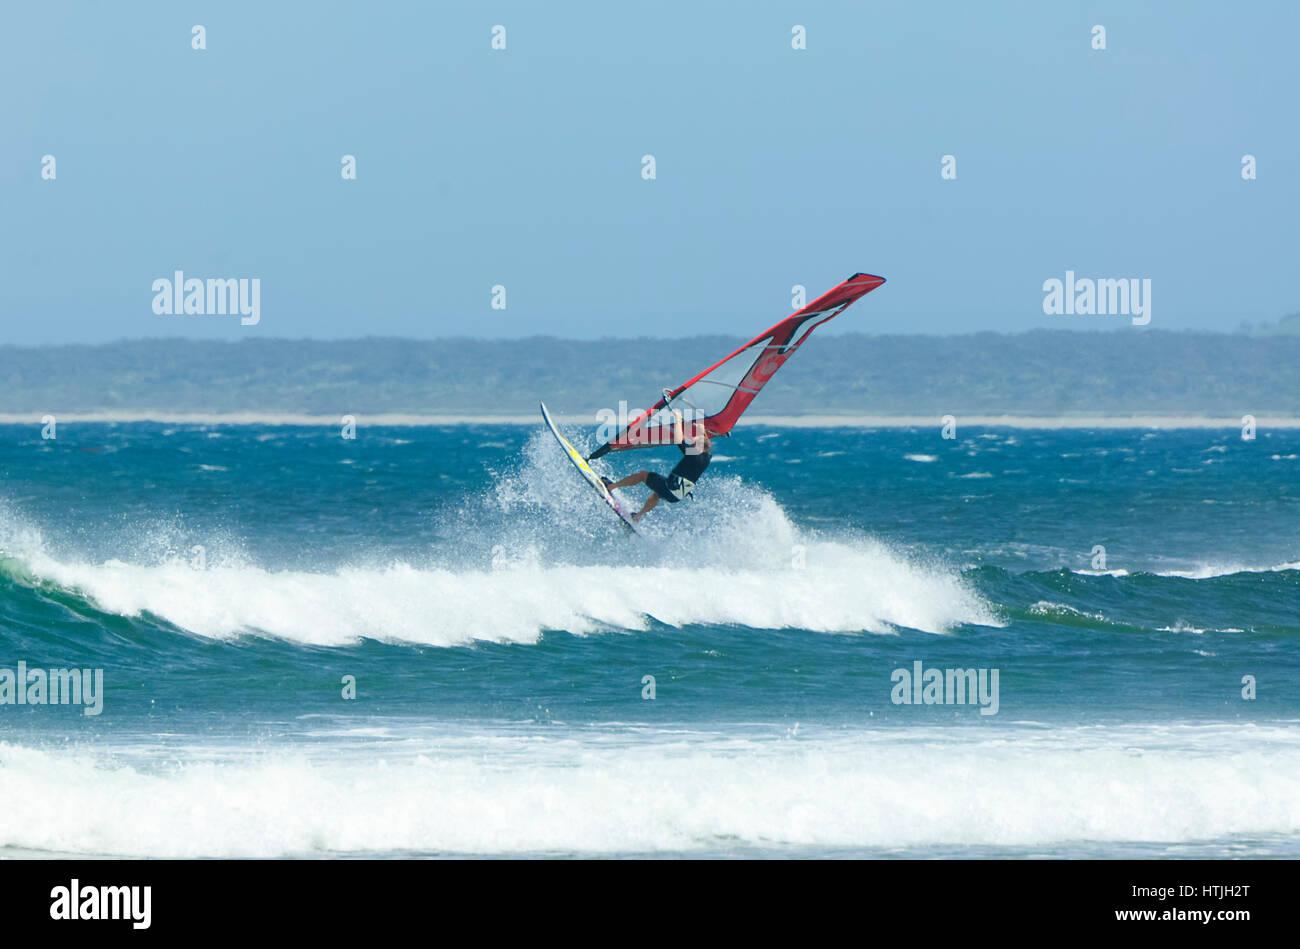 Windsurfer jumping over a big wave at Seven Mile Beach, Gerroa, Illawarra Coast, New South Wales, NSW, Australia - Stock Image